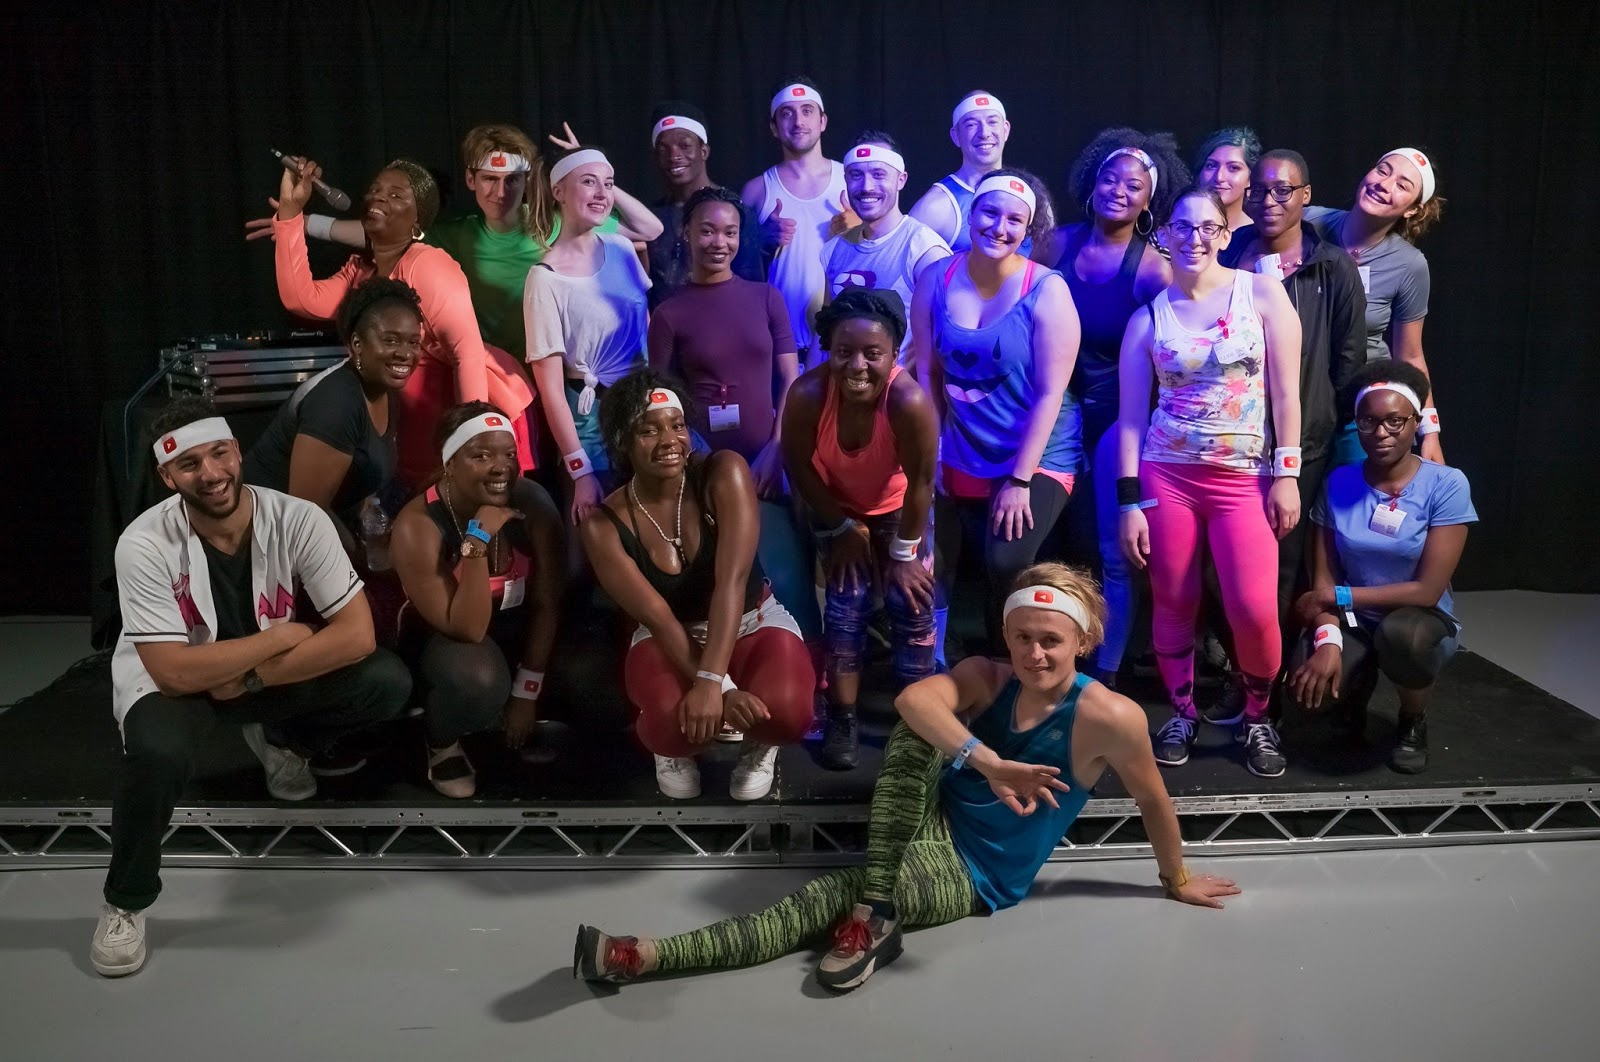 TASHIKA BAILEY | SCOLA DONDO'S LIT 80's FITNESS DANCE CLASS